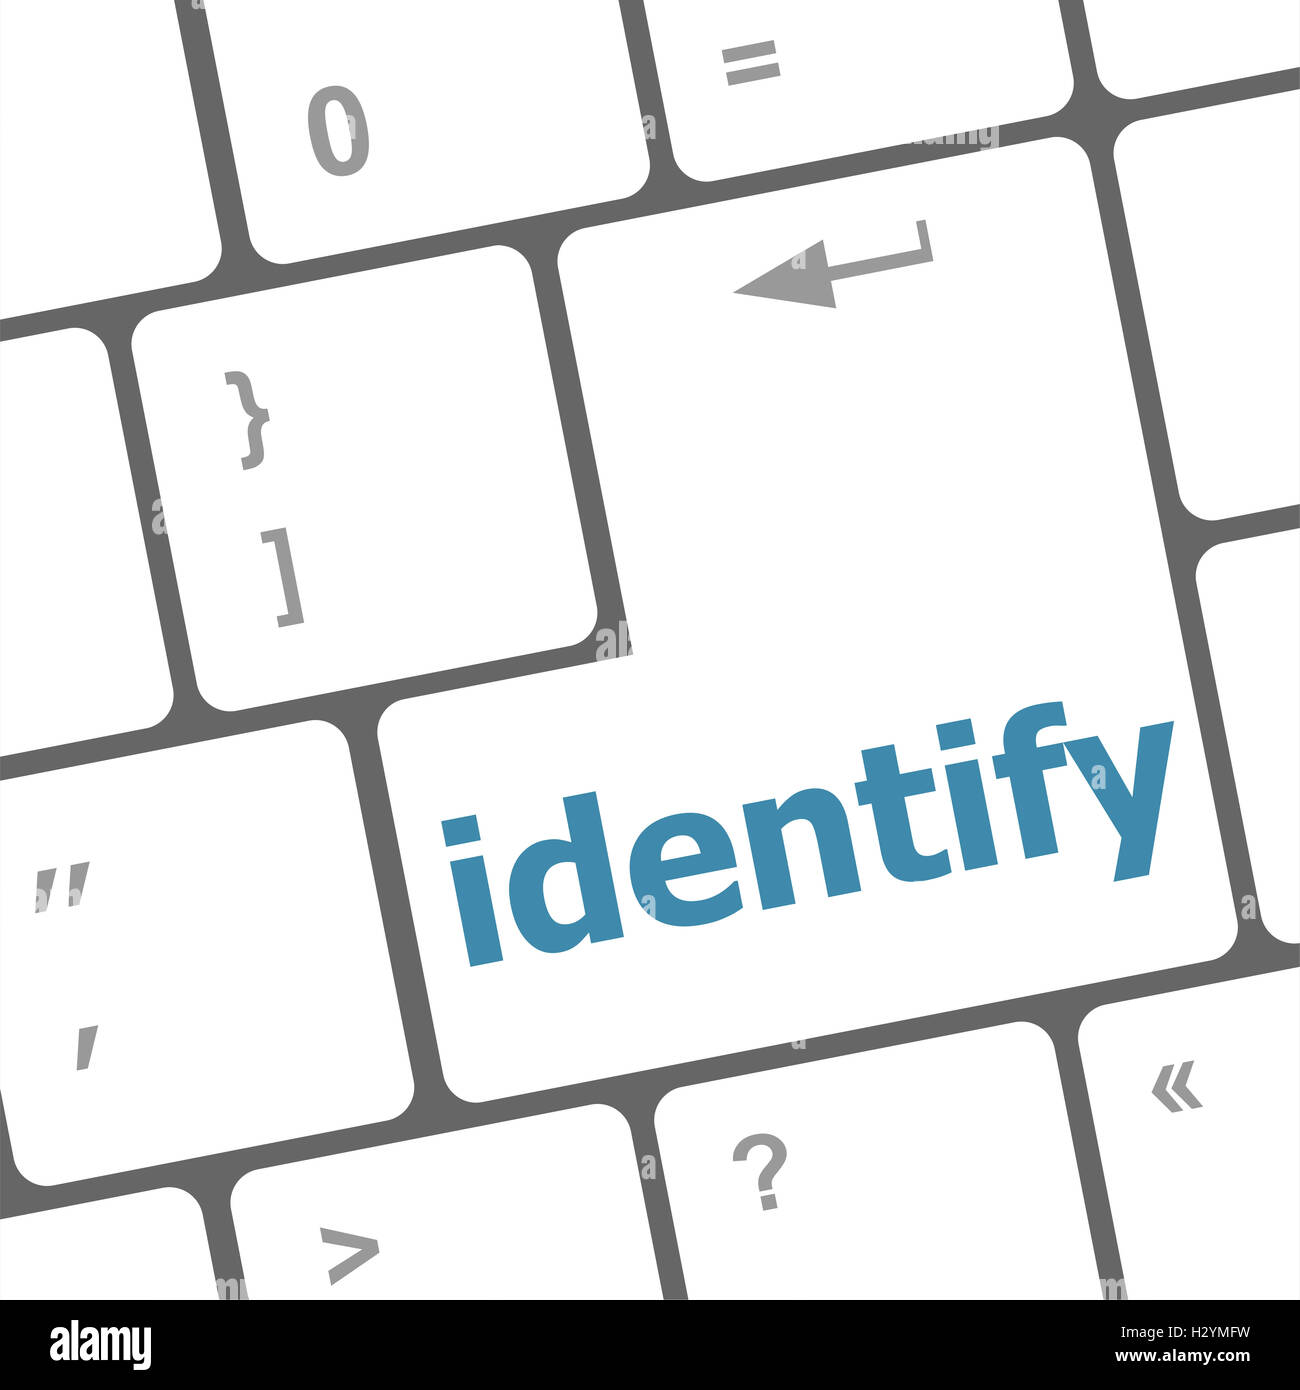 Identify Stockfotos & Identify Bilder - Alamy